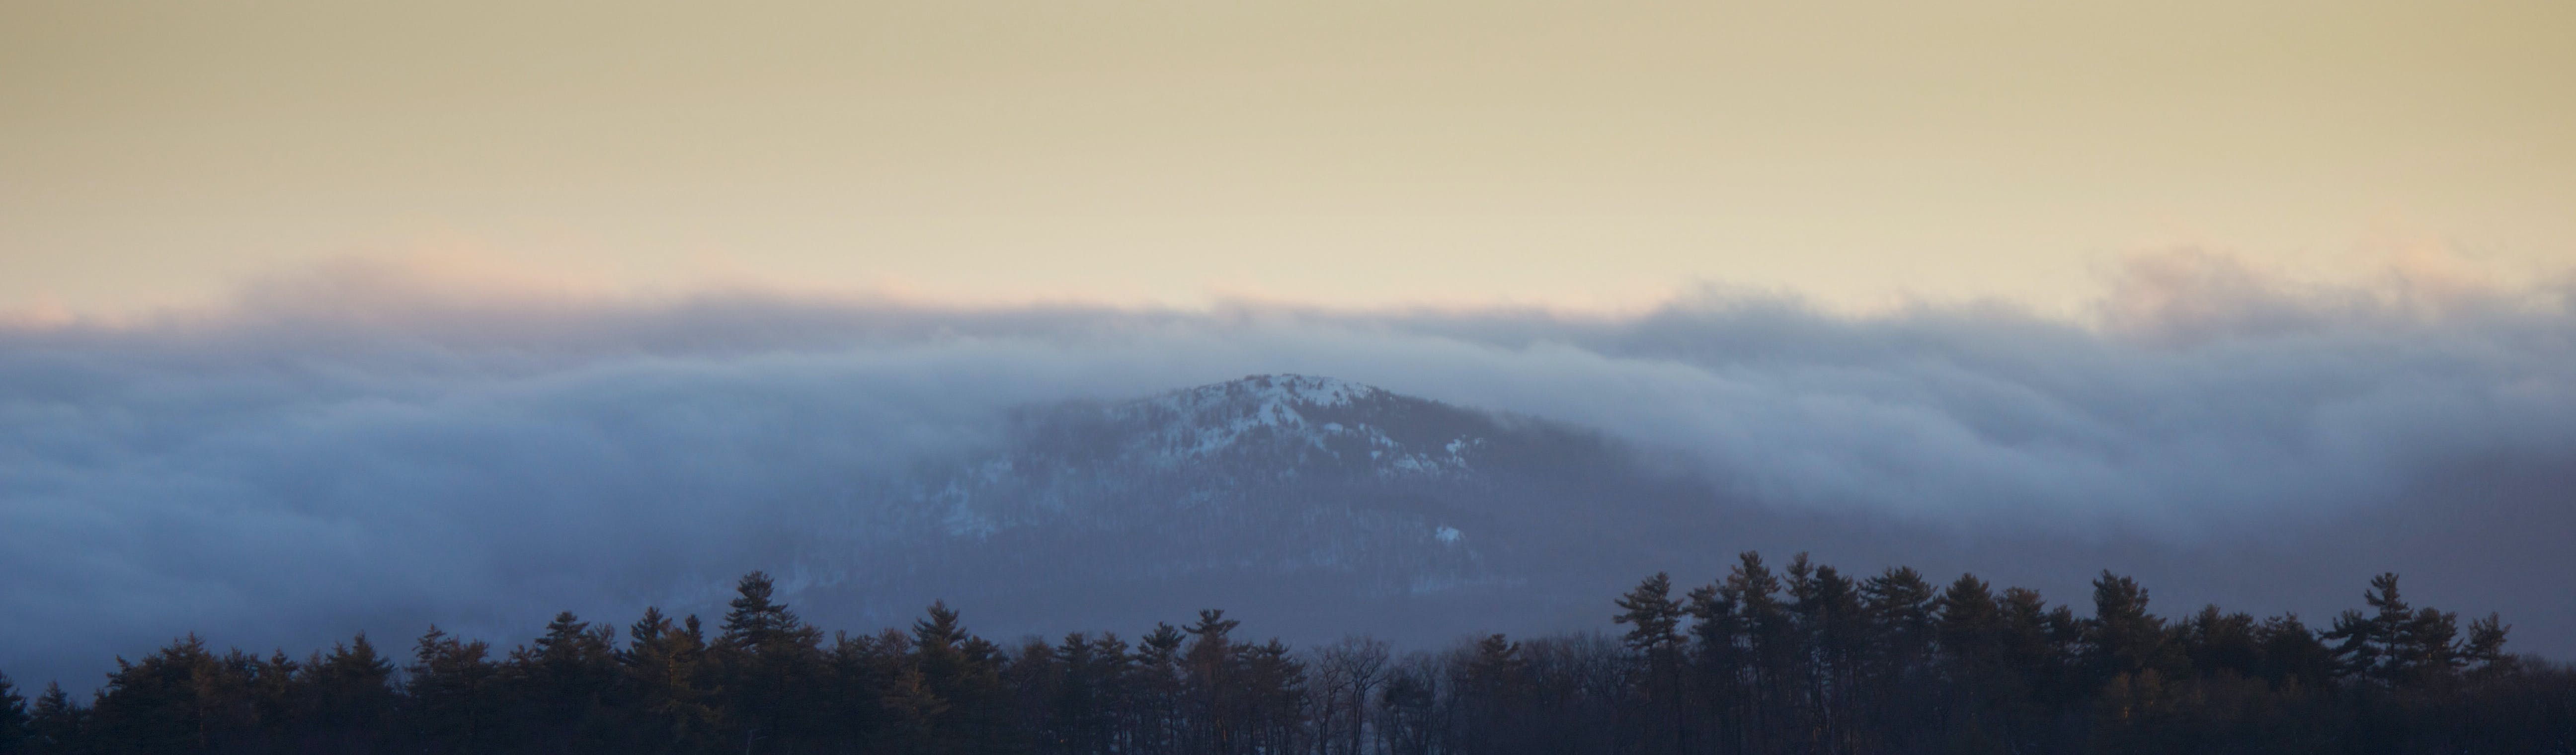 Free stock photo of landscape, trees, mountain, panorama